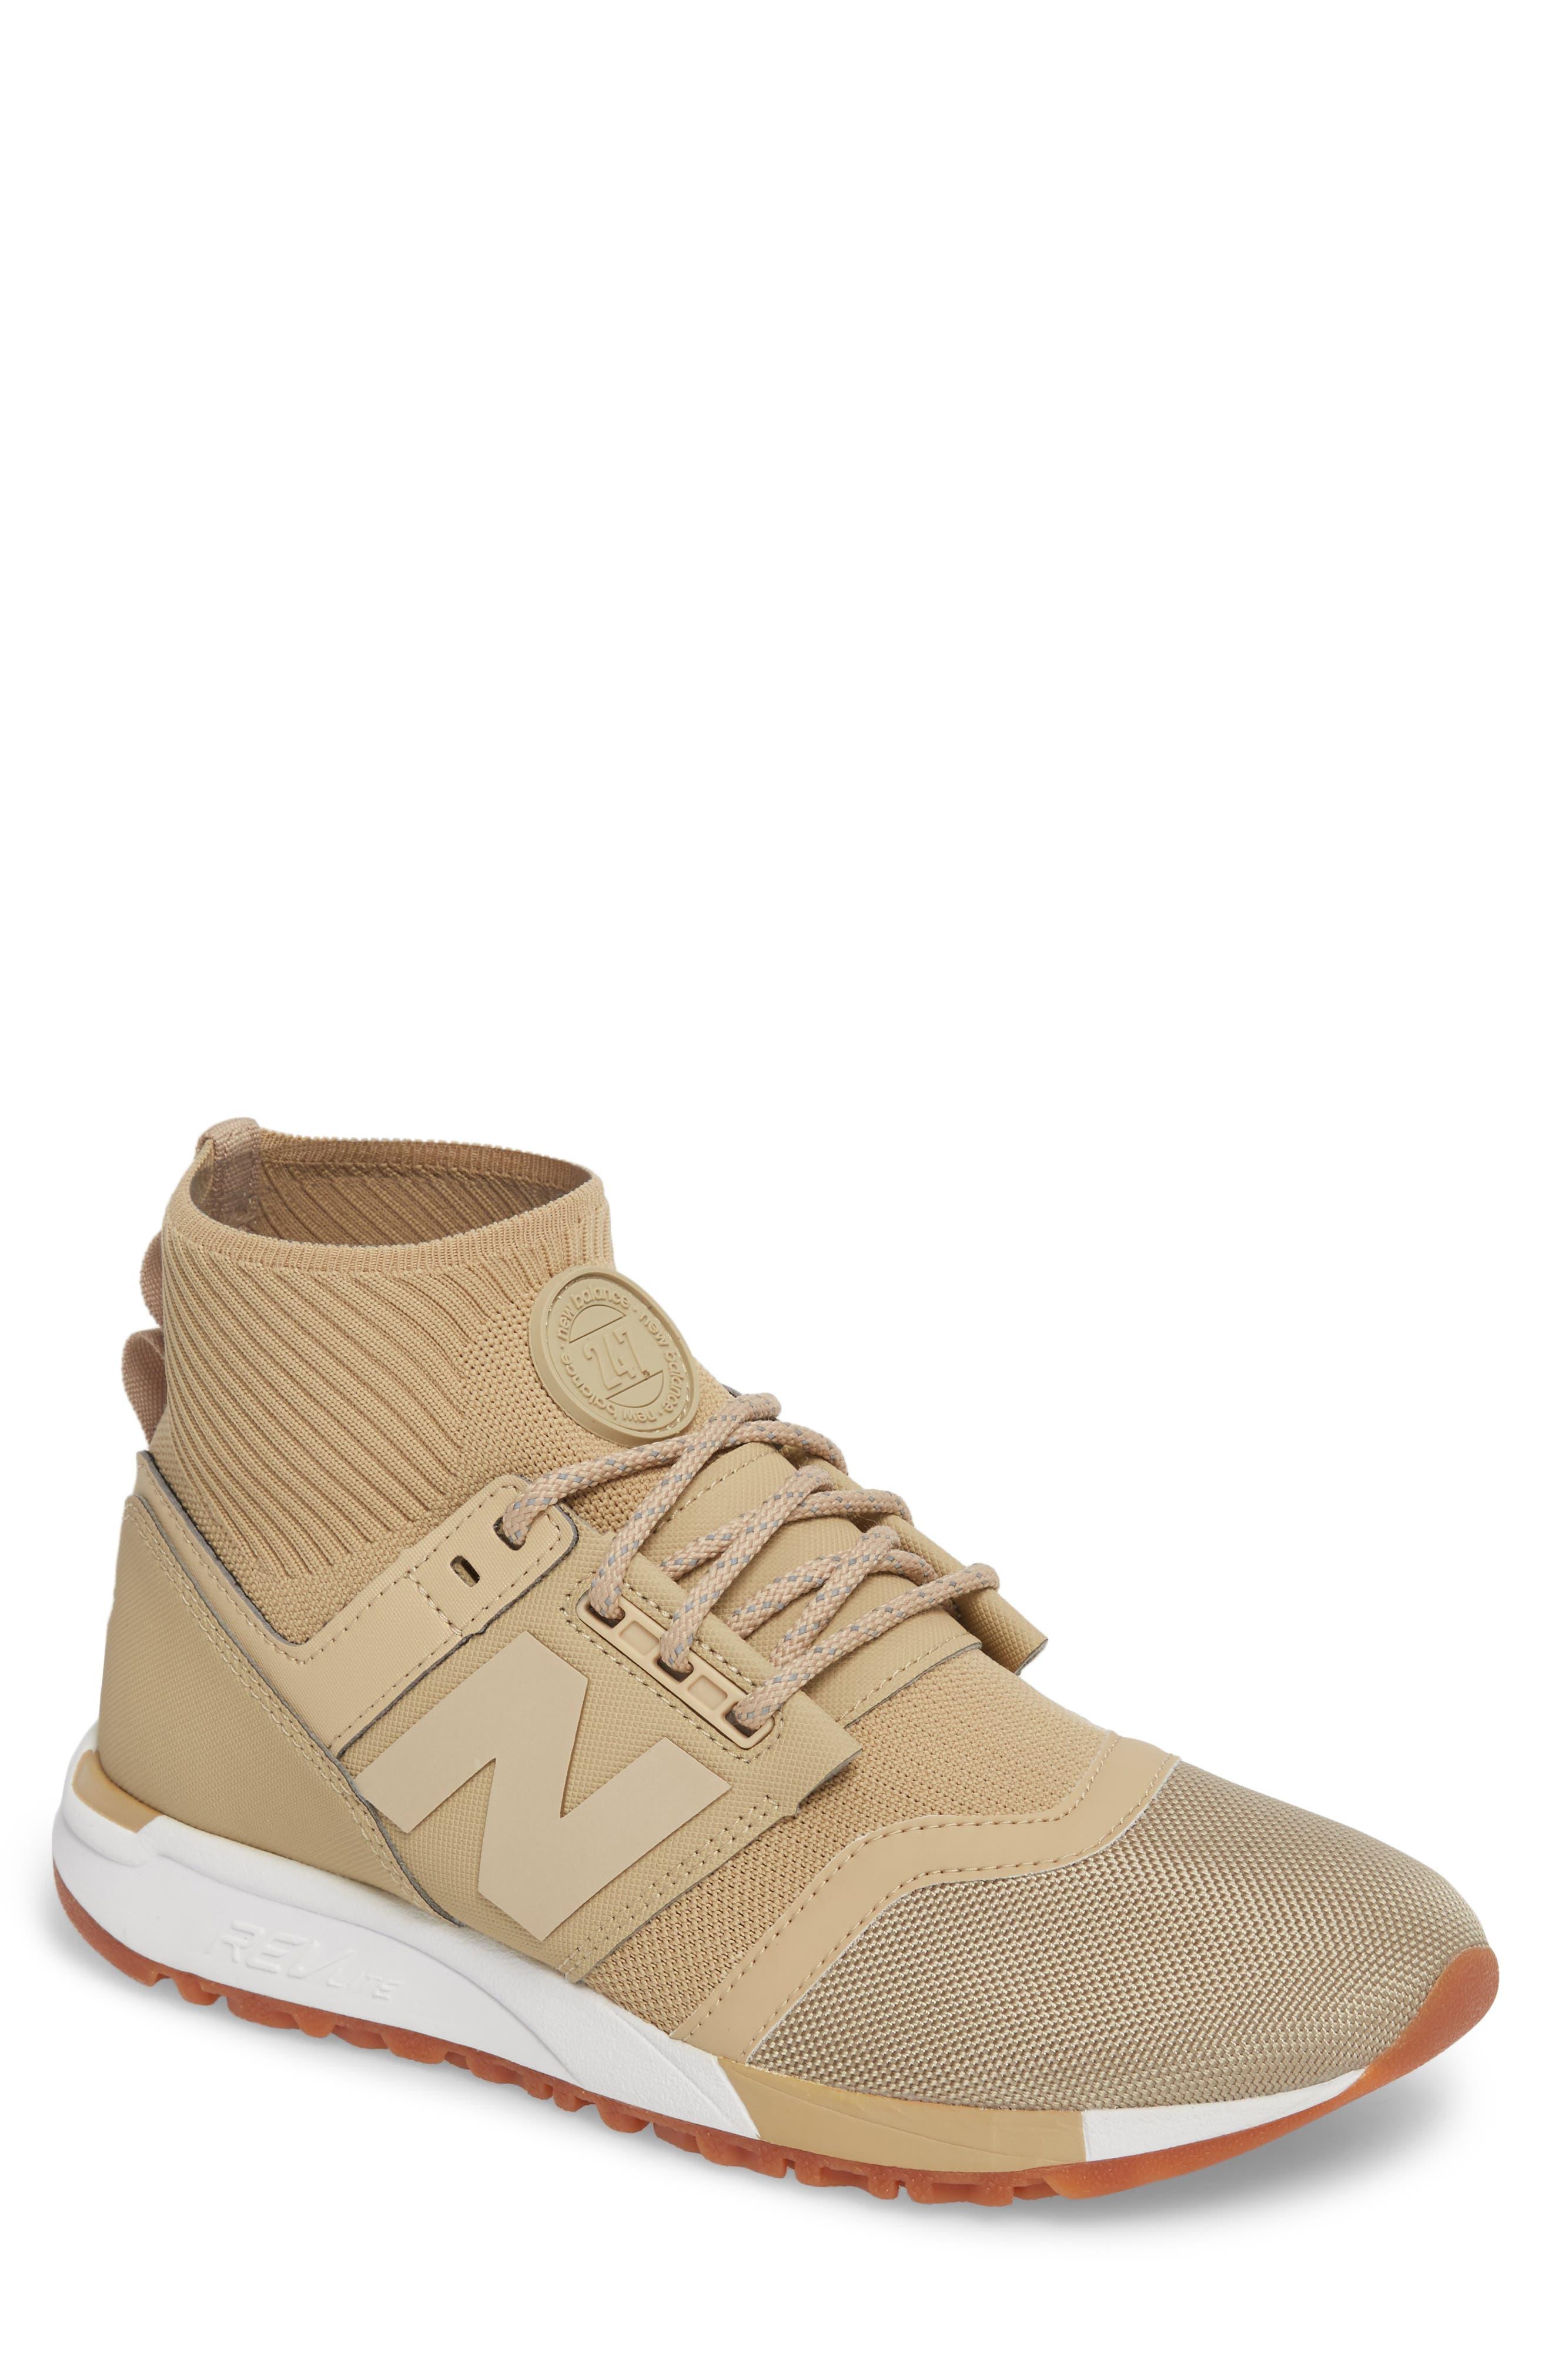 247 Mid Sneaker,                             Main thumbnail 3, color,